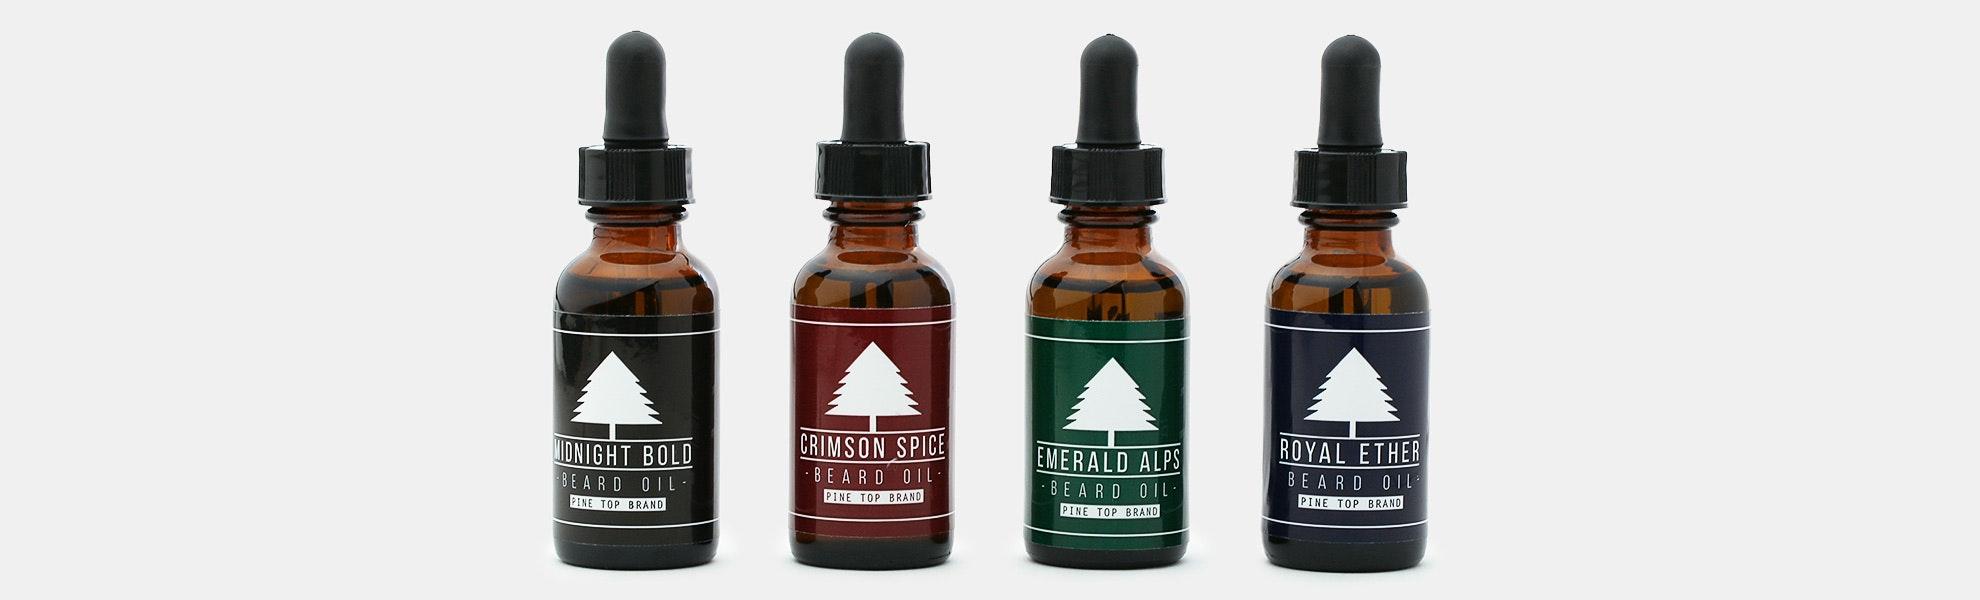 Pine Top Beard Oil